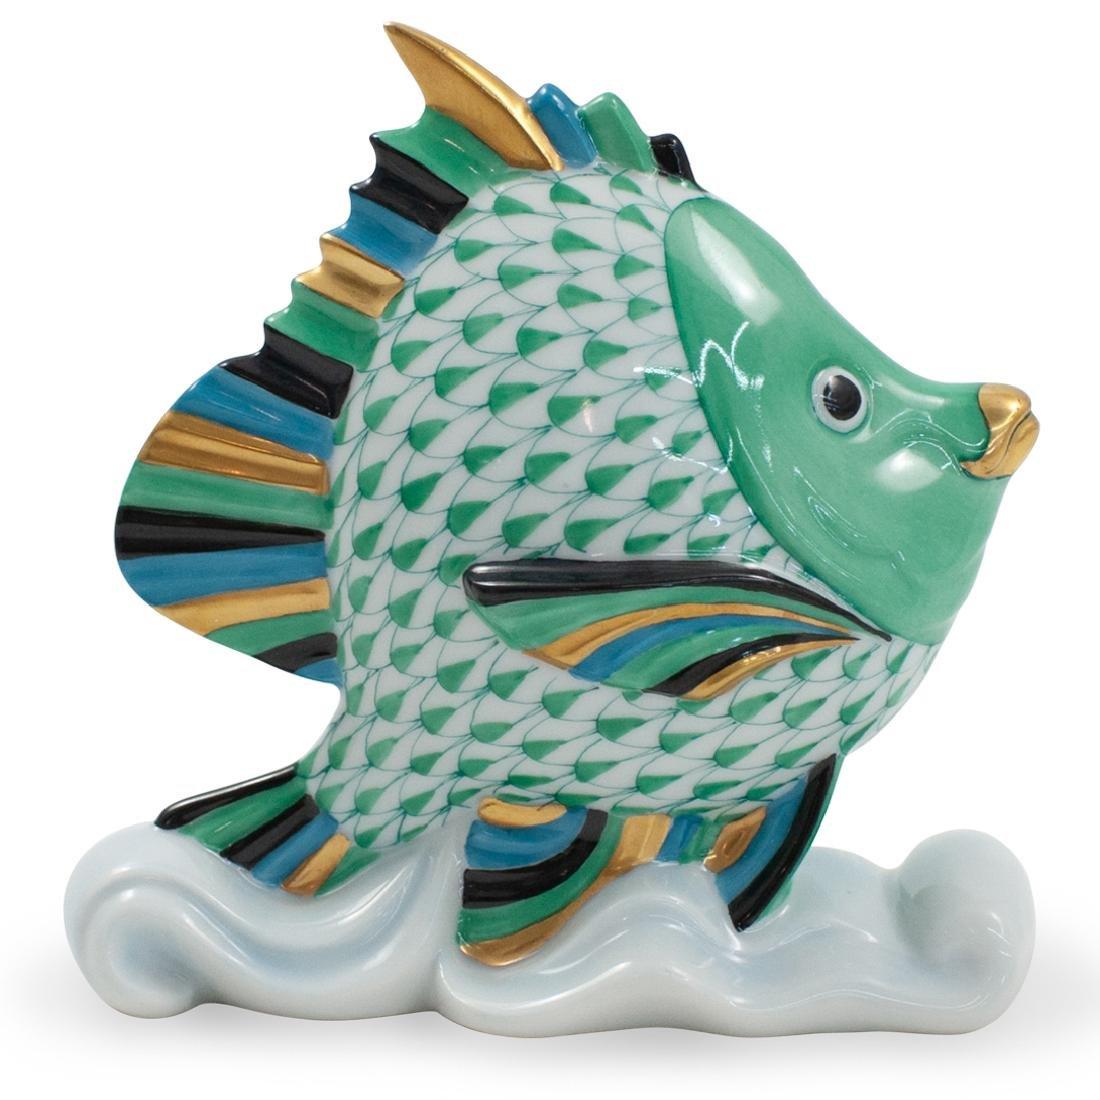 Herend Porcelain Fishnet Tropical Fish